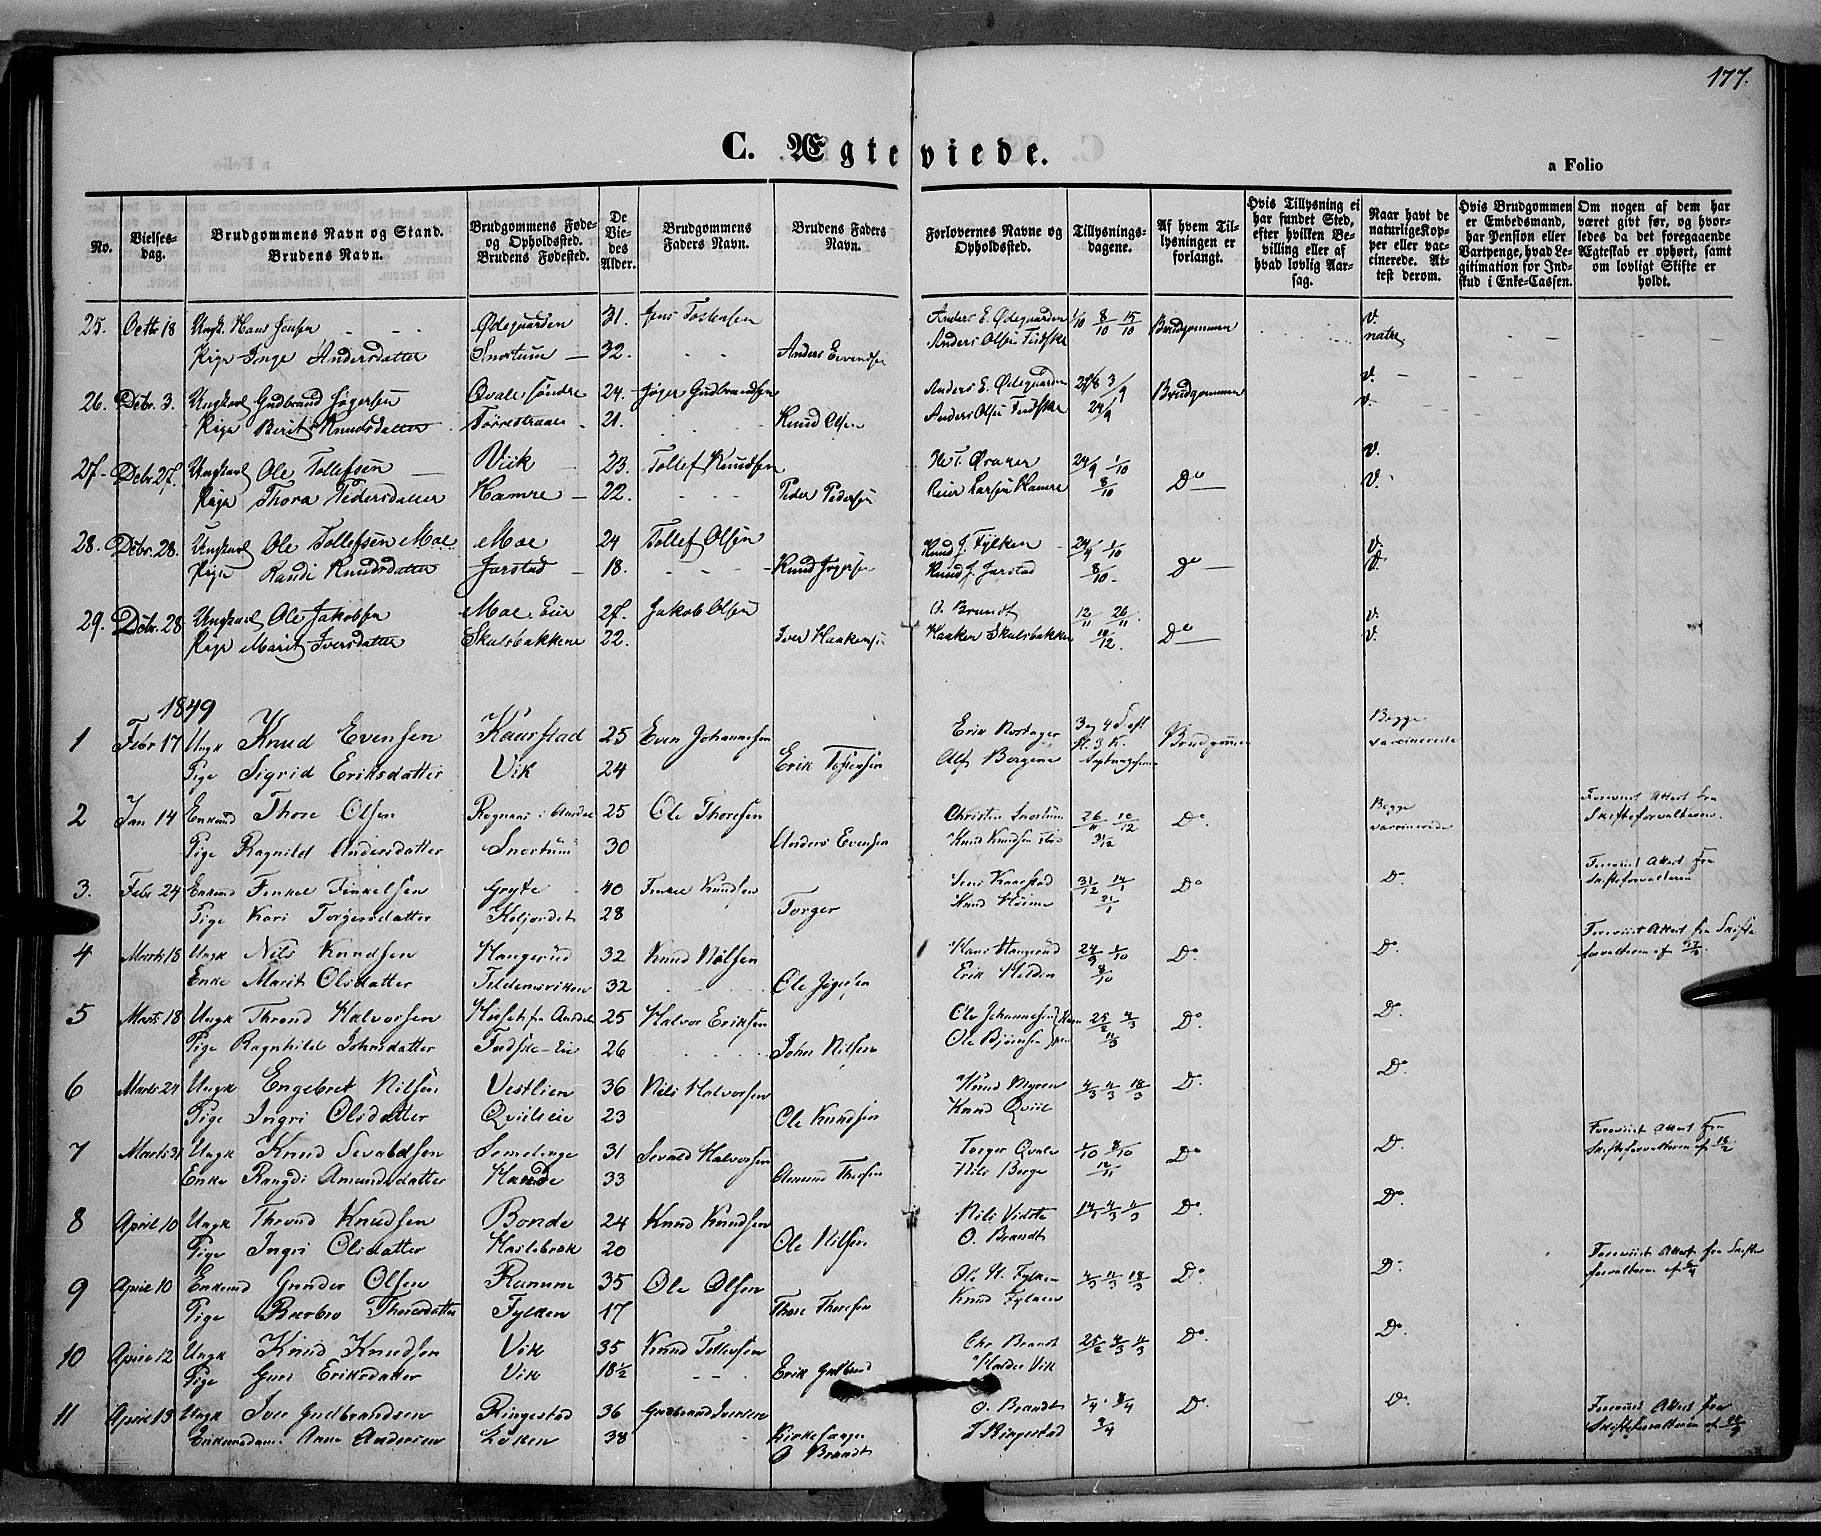 SAH, Vestre Slidre prestekontor, Ministerialbok nr. 1, 1844-1855, s. 177